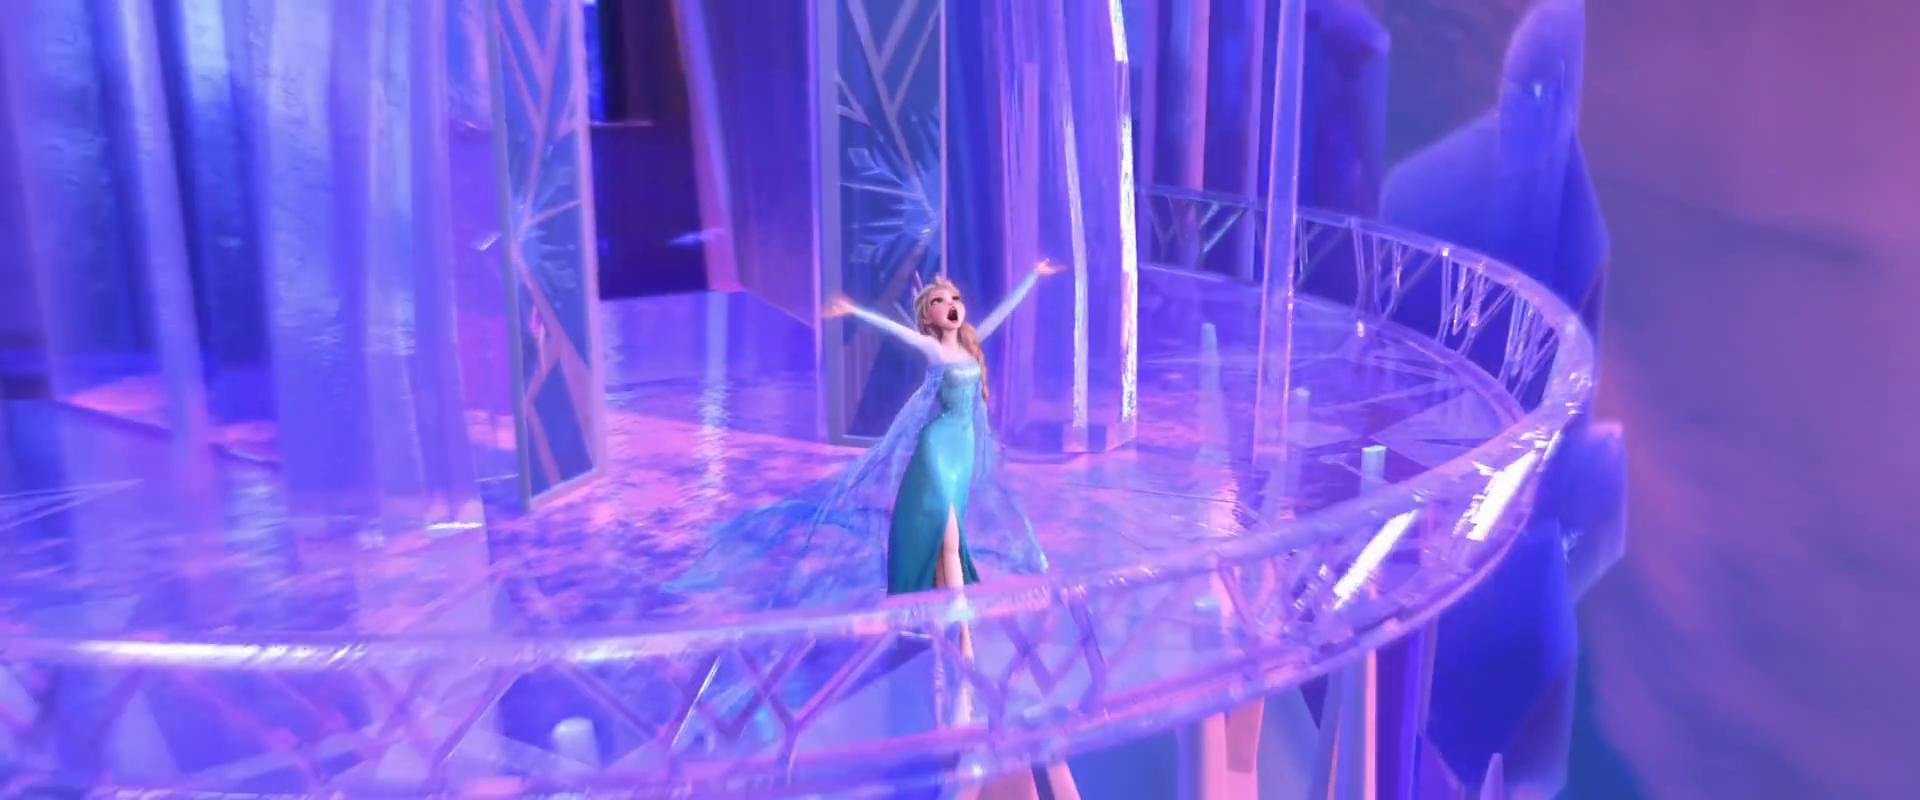 A Disney Princess Vs The Real World The Snow Queen Reins Supreme Thoughts On Disney S Frozen Frozen Sing Frozen Songs Frozen Elsa Castle